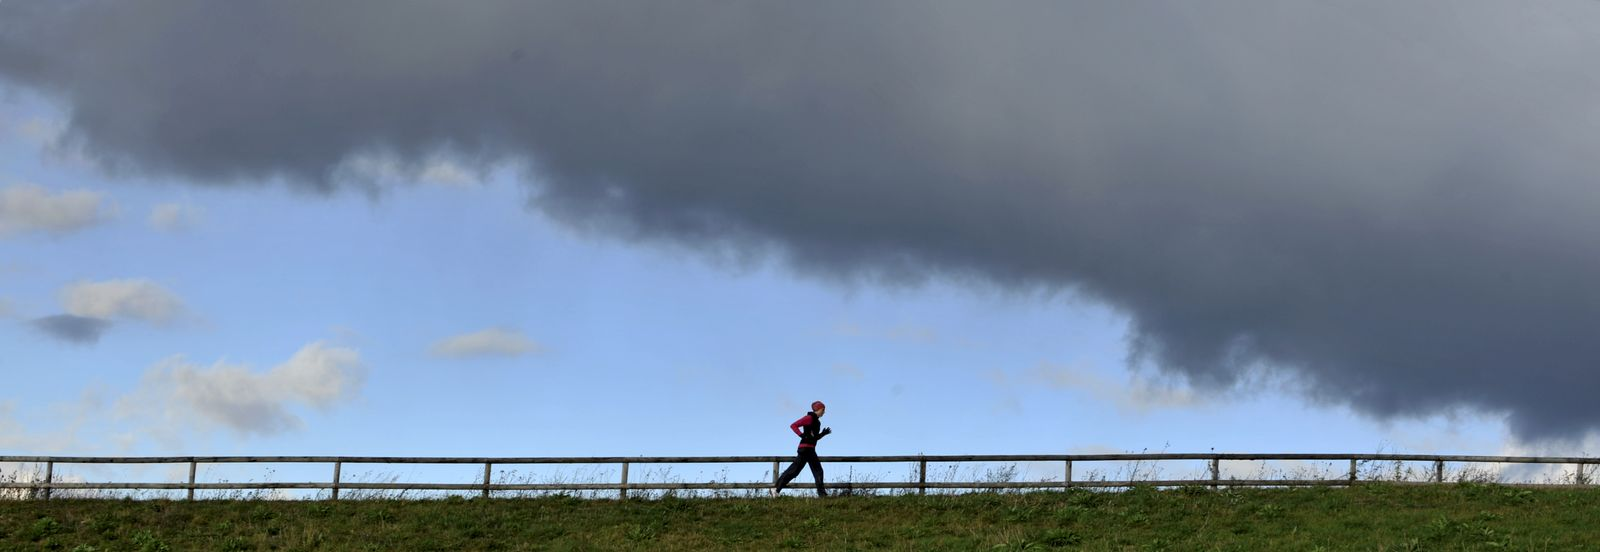 Laufen / Joggen / Regen / Fitness